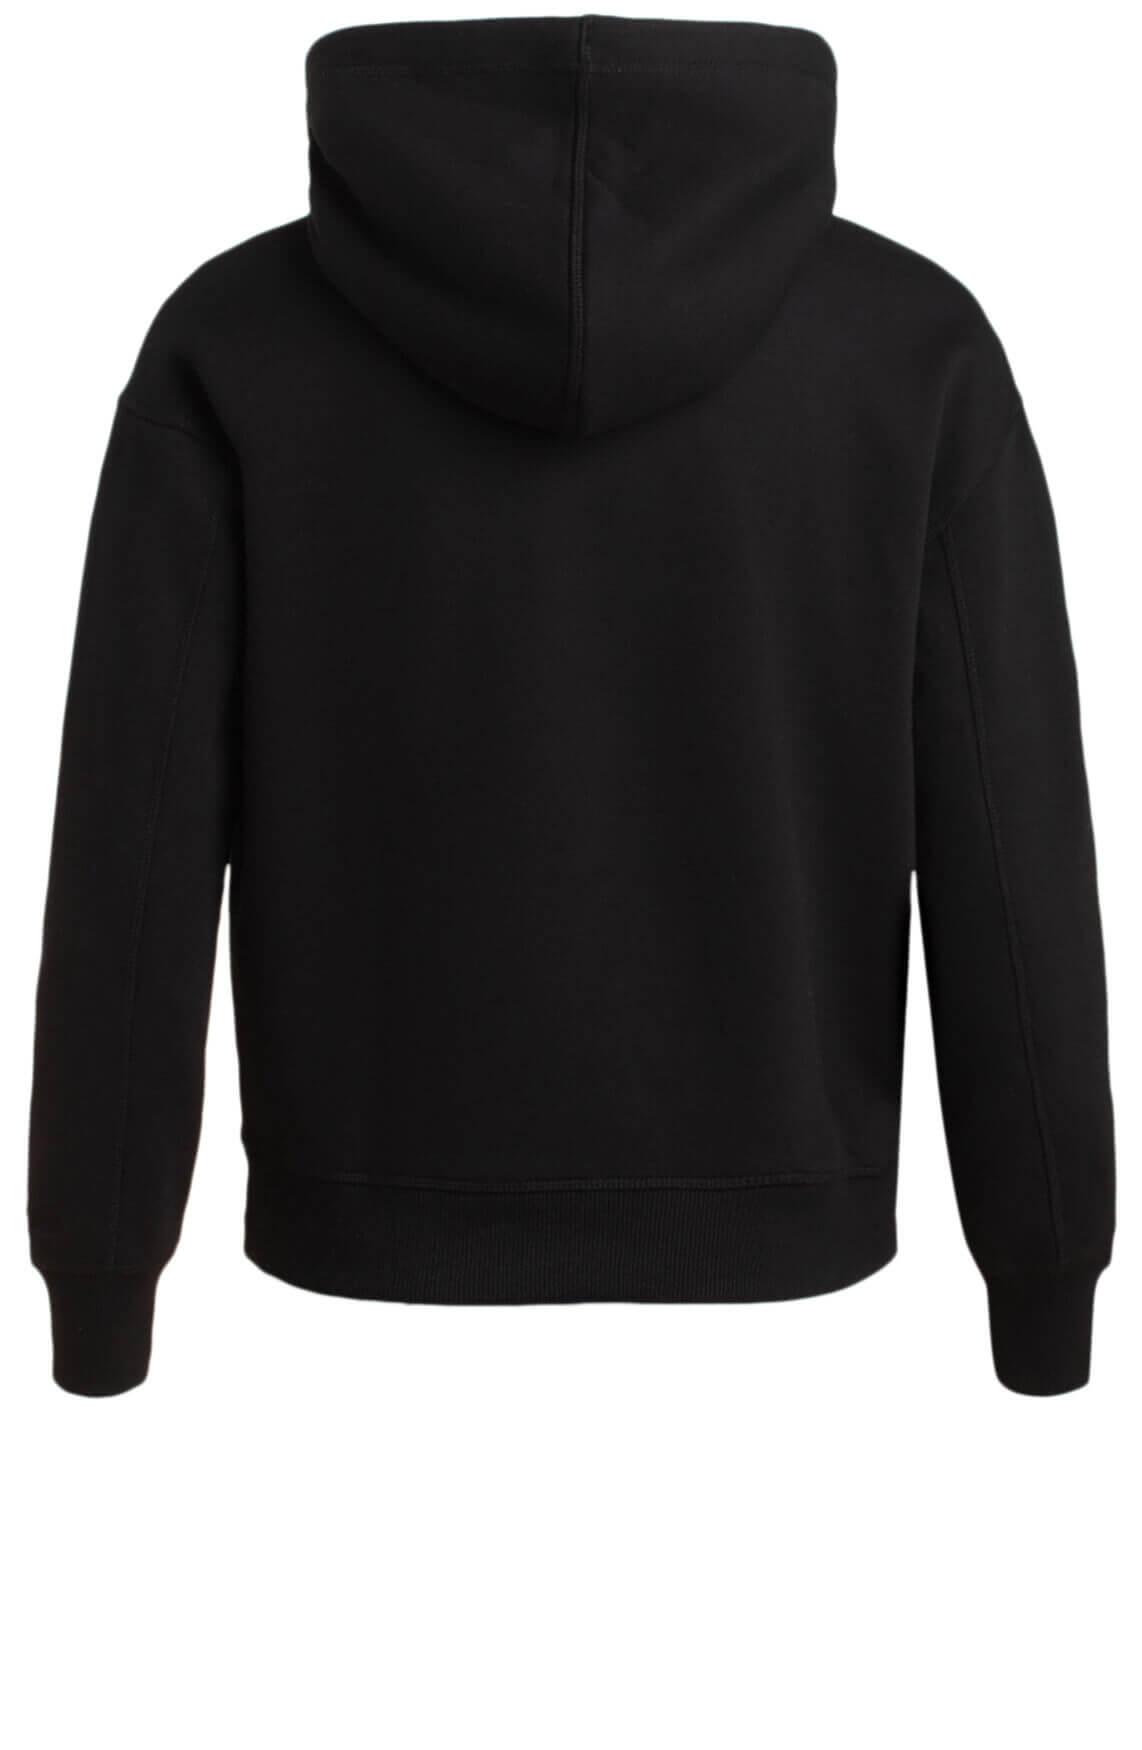 Calvin Klein Dames Sweater met capuchon zwart